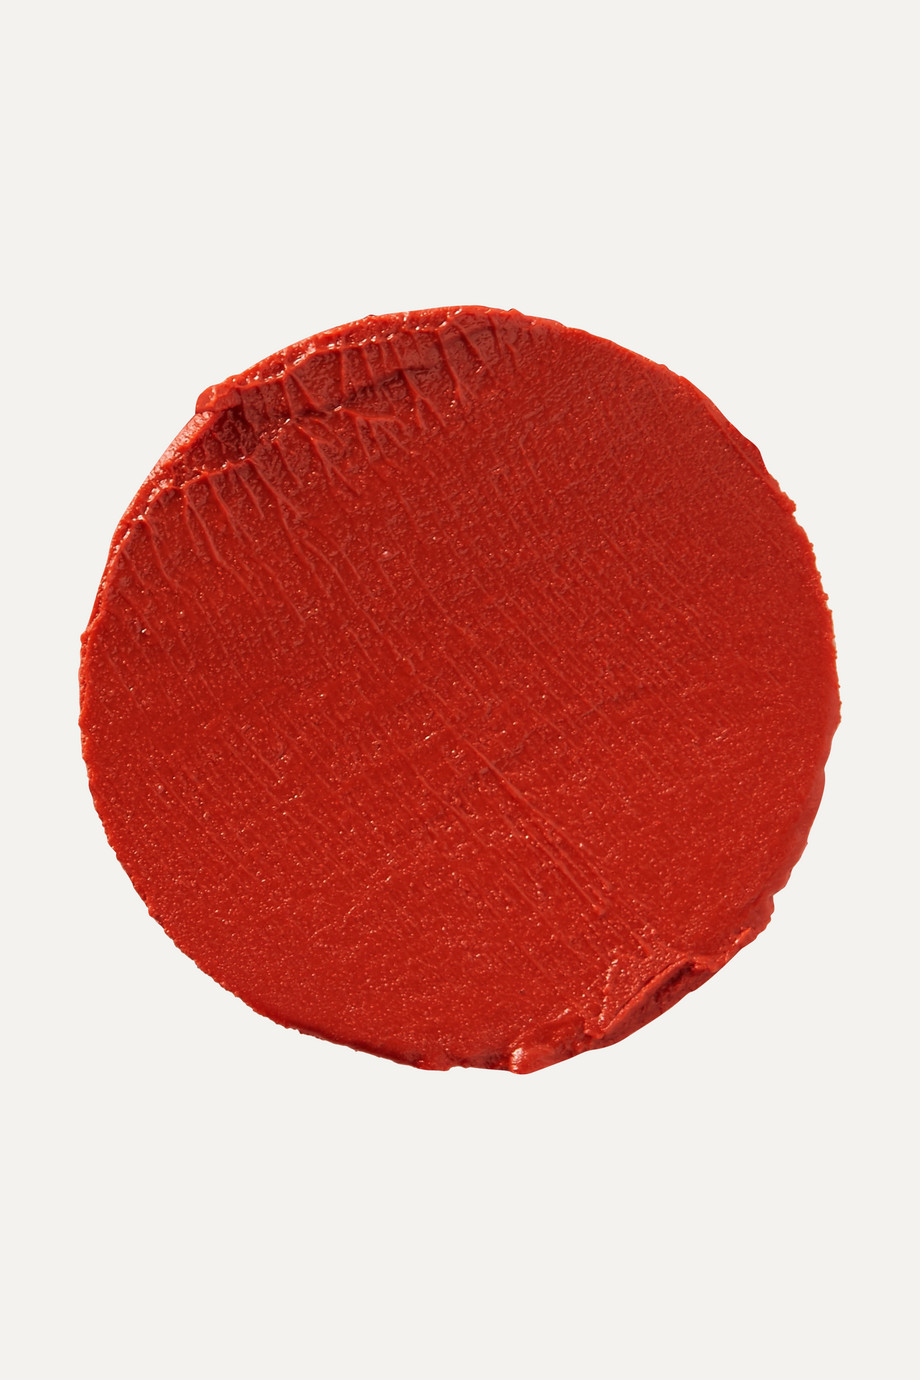 Lipstick Queen Sinner Lipstick – Coral Red – Lippenstift